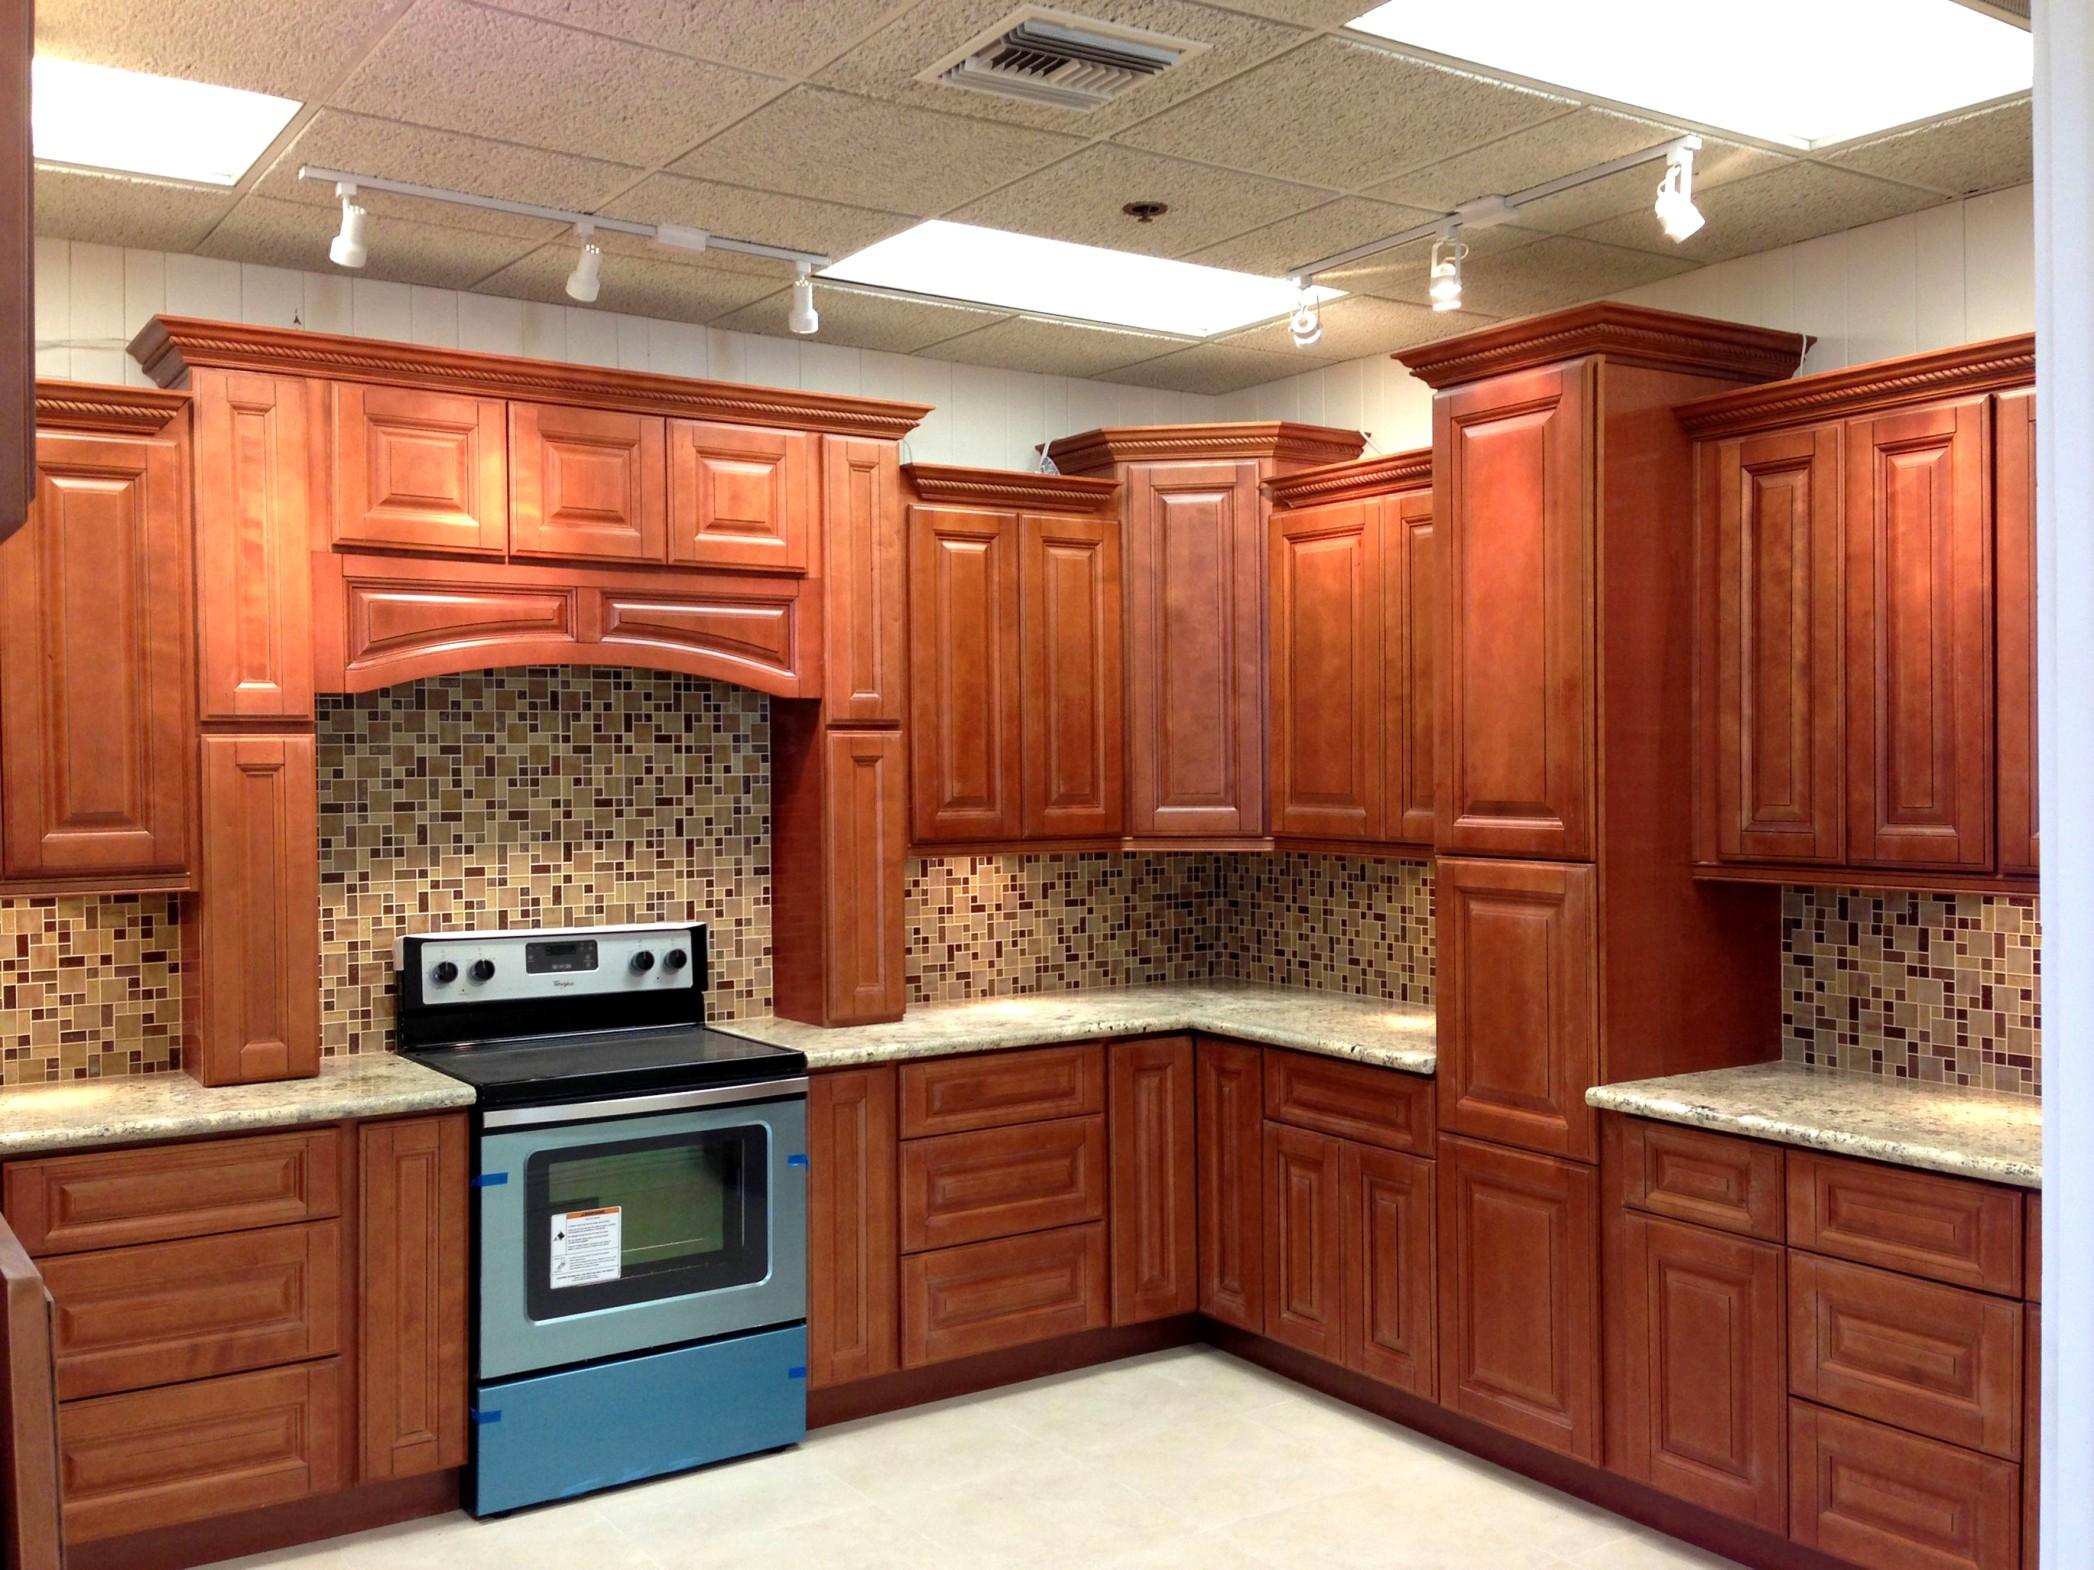 Apex Kitchen Cabinet and Granite Countertop, Bakersfield ...